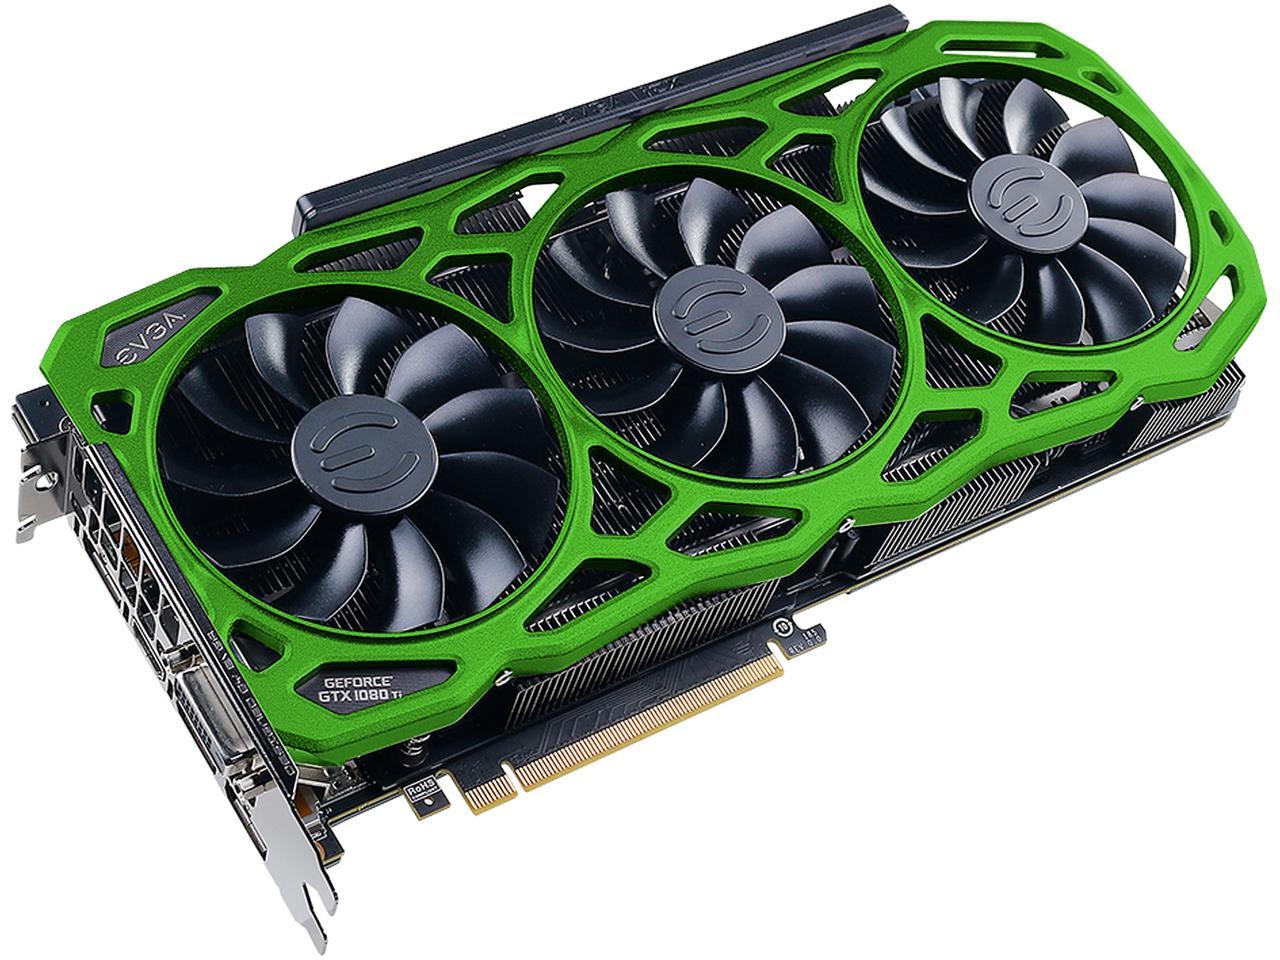 EVGA GeForce GTX 1080 Ti FTW3 Blue/Green $700 +$100 Newegg GC